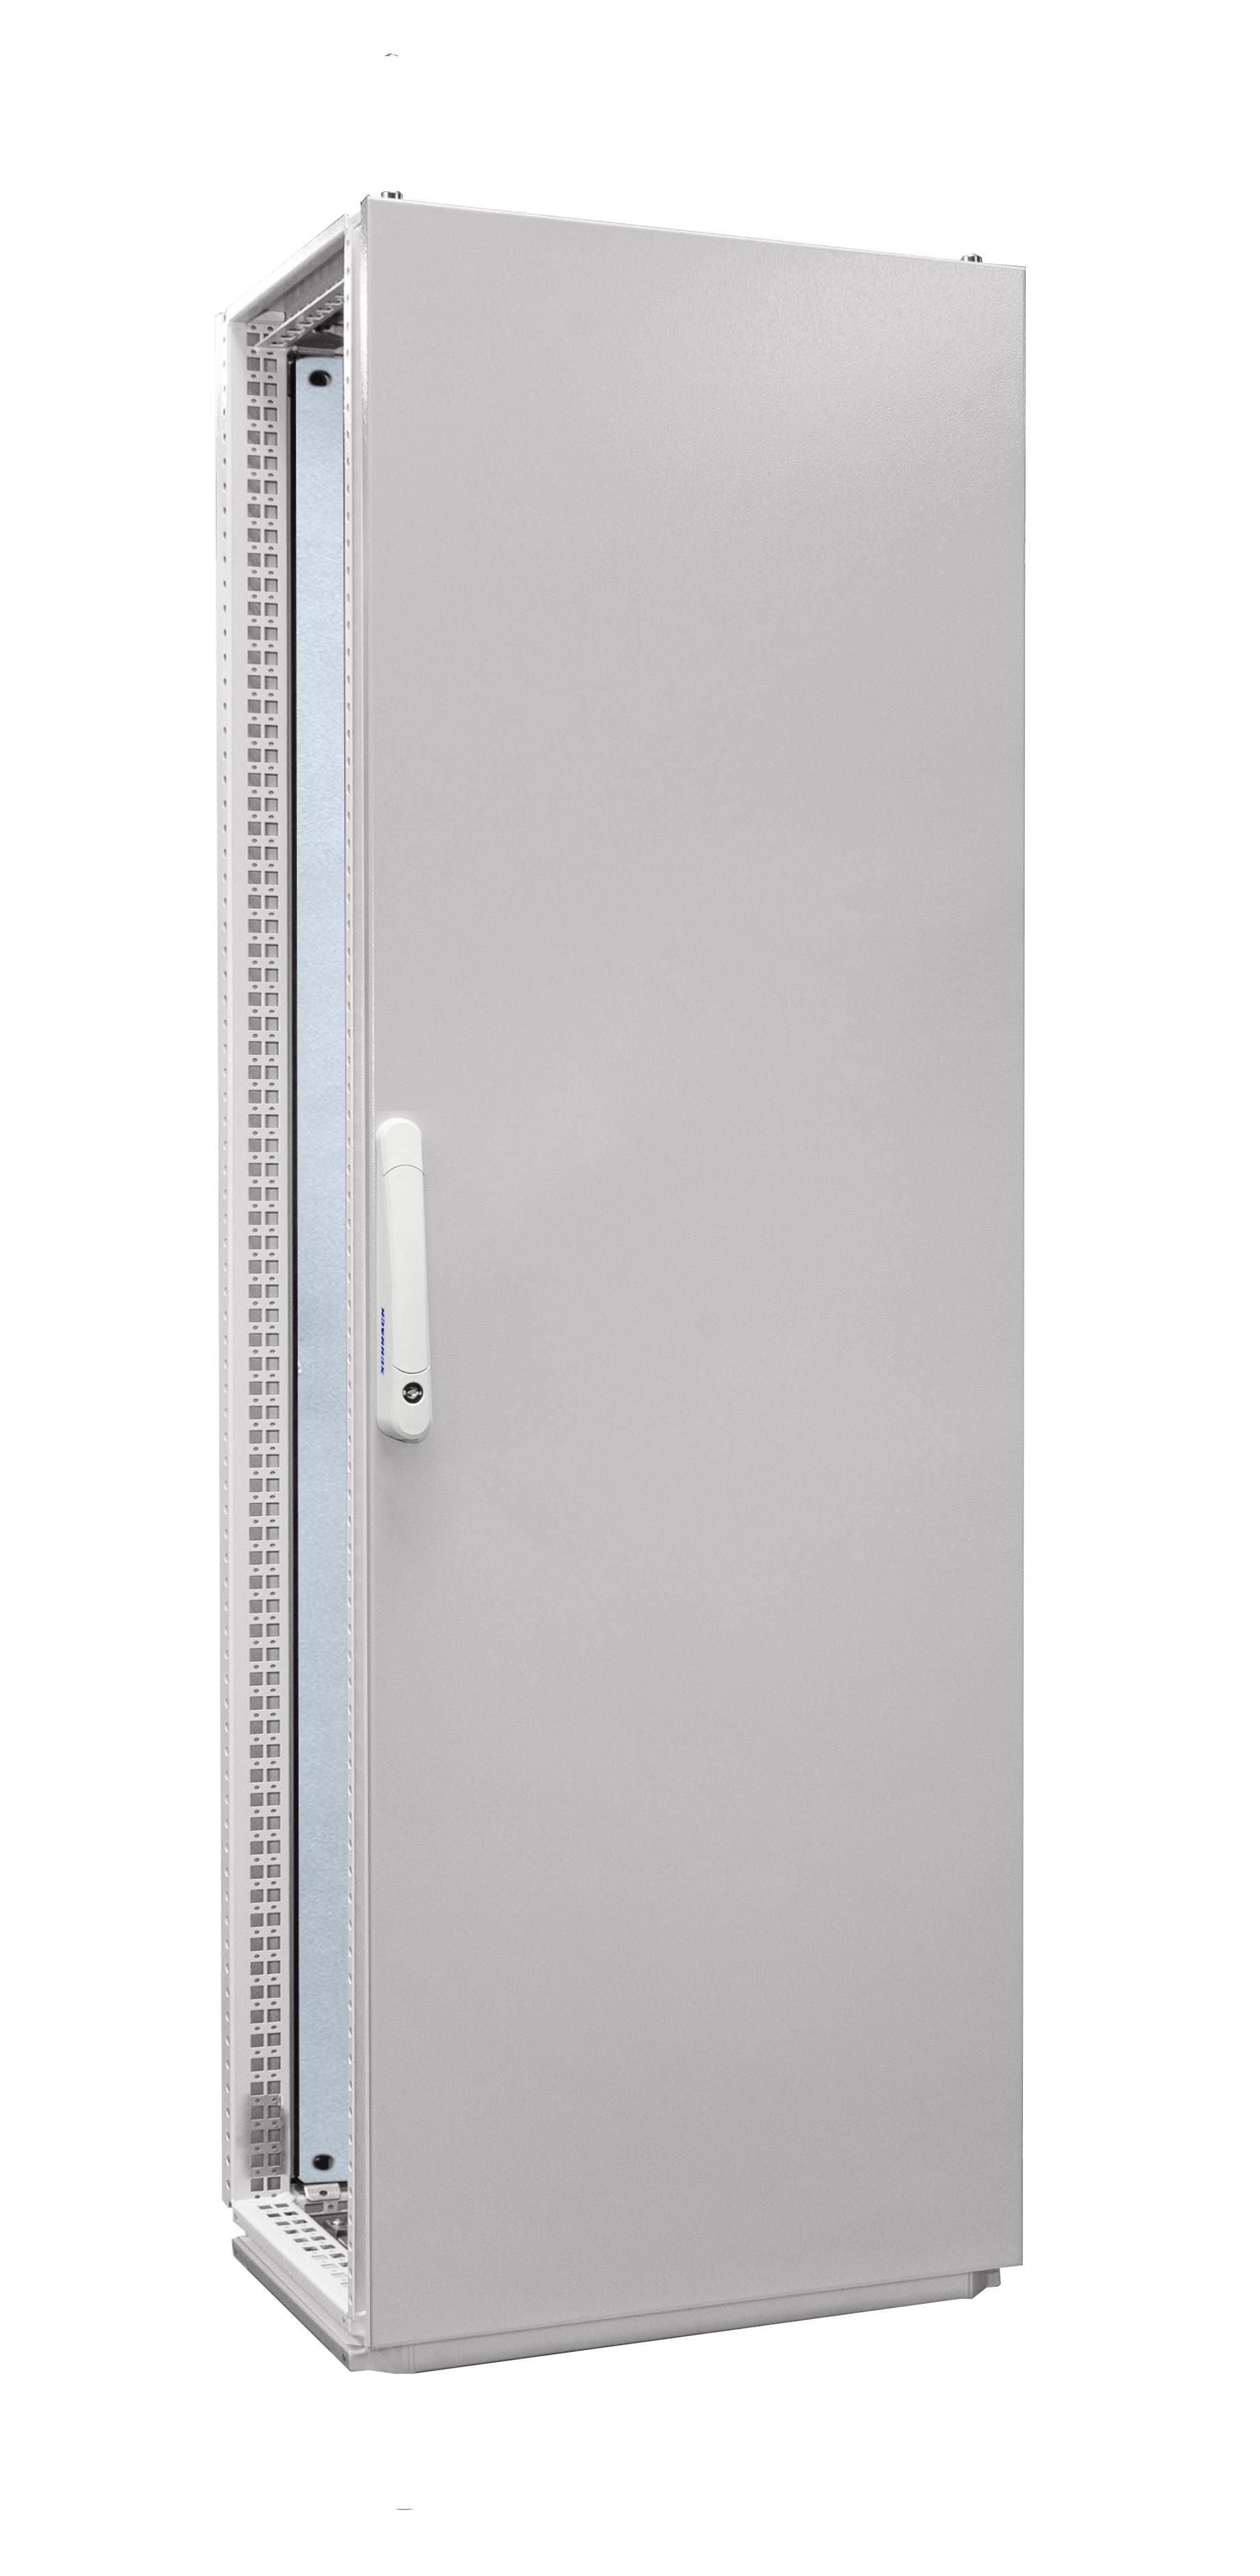 1 Stk Anreihschrank 1-Tür IP55 H=1800 B=600 T=500mm Stahlblech AC186050--